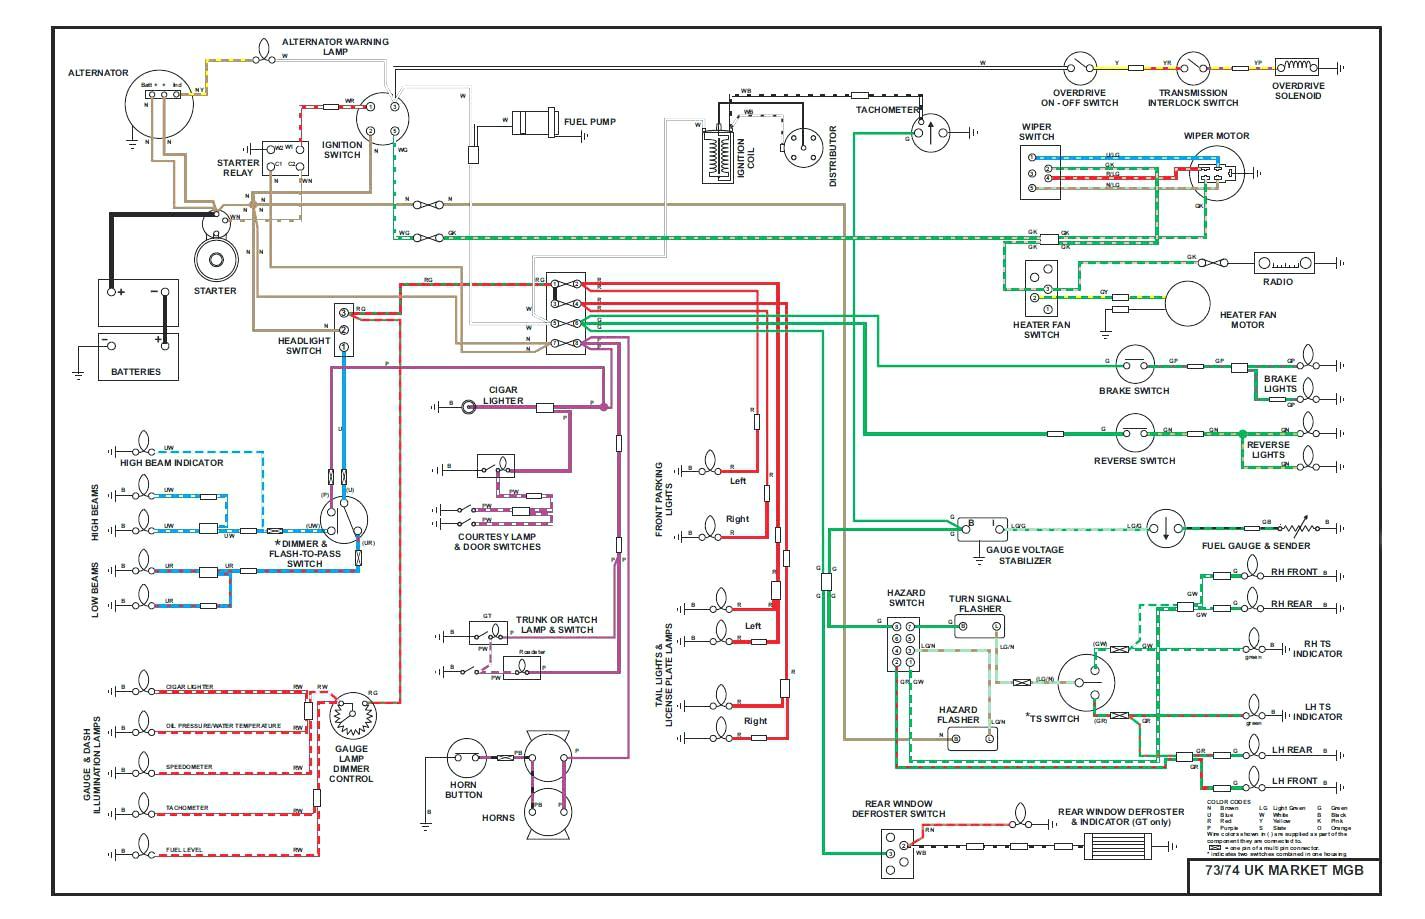 71 72 mgb wiring diagram diagrams schematics in jpg